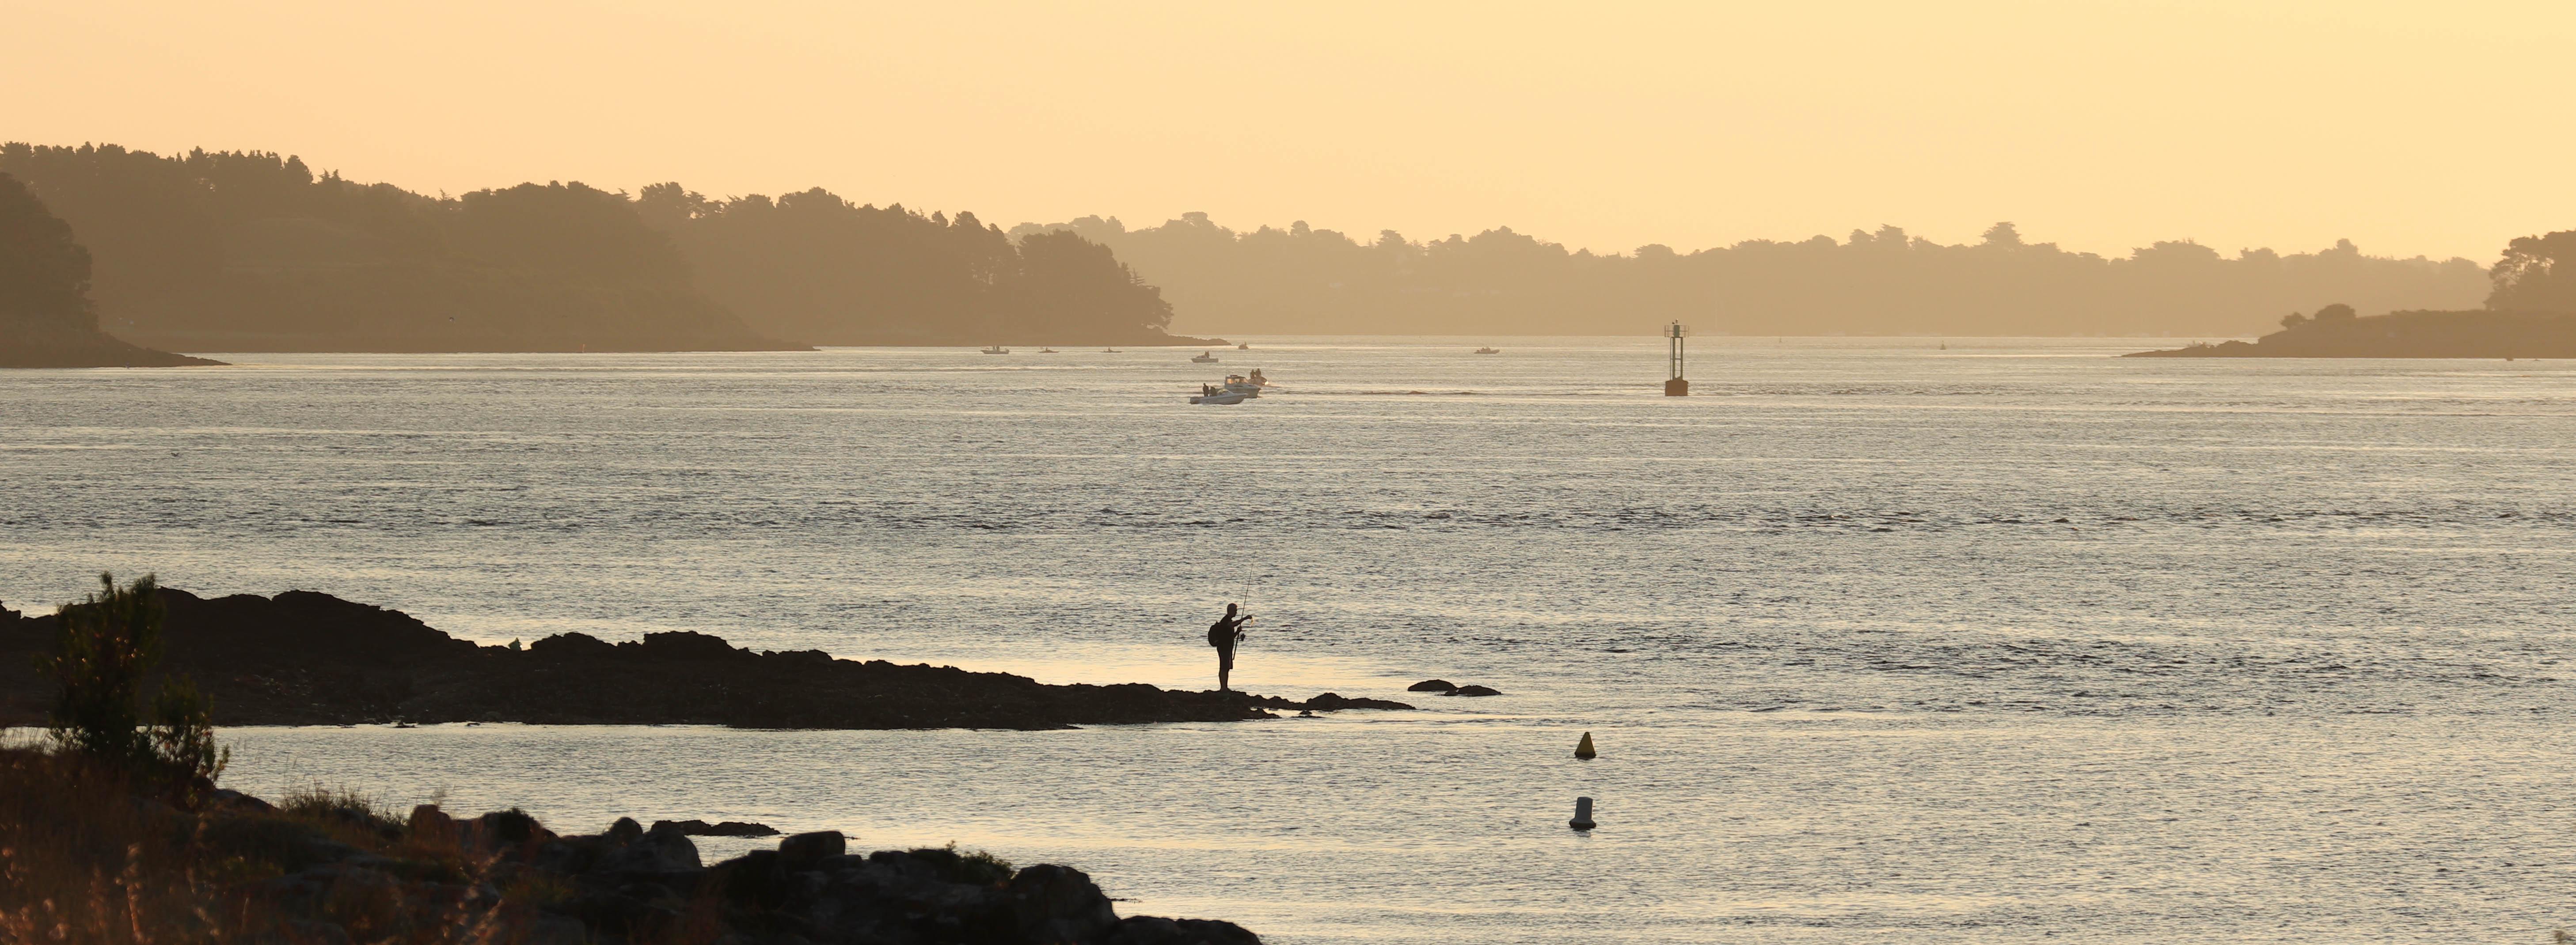 pêcheur, Golfe, 5 août 18, 6h21 (1 sur 1).jpg